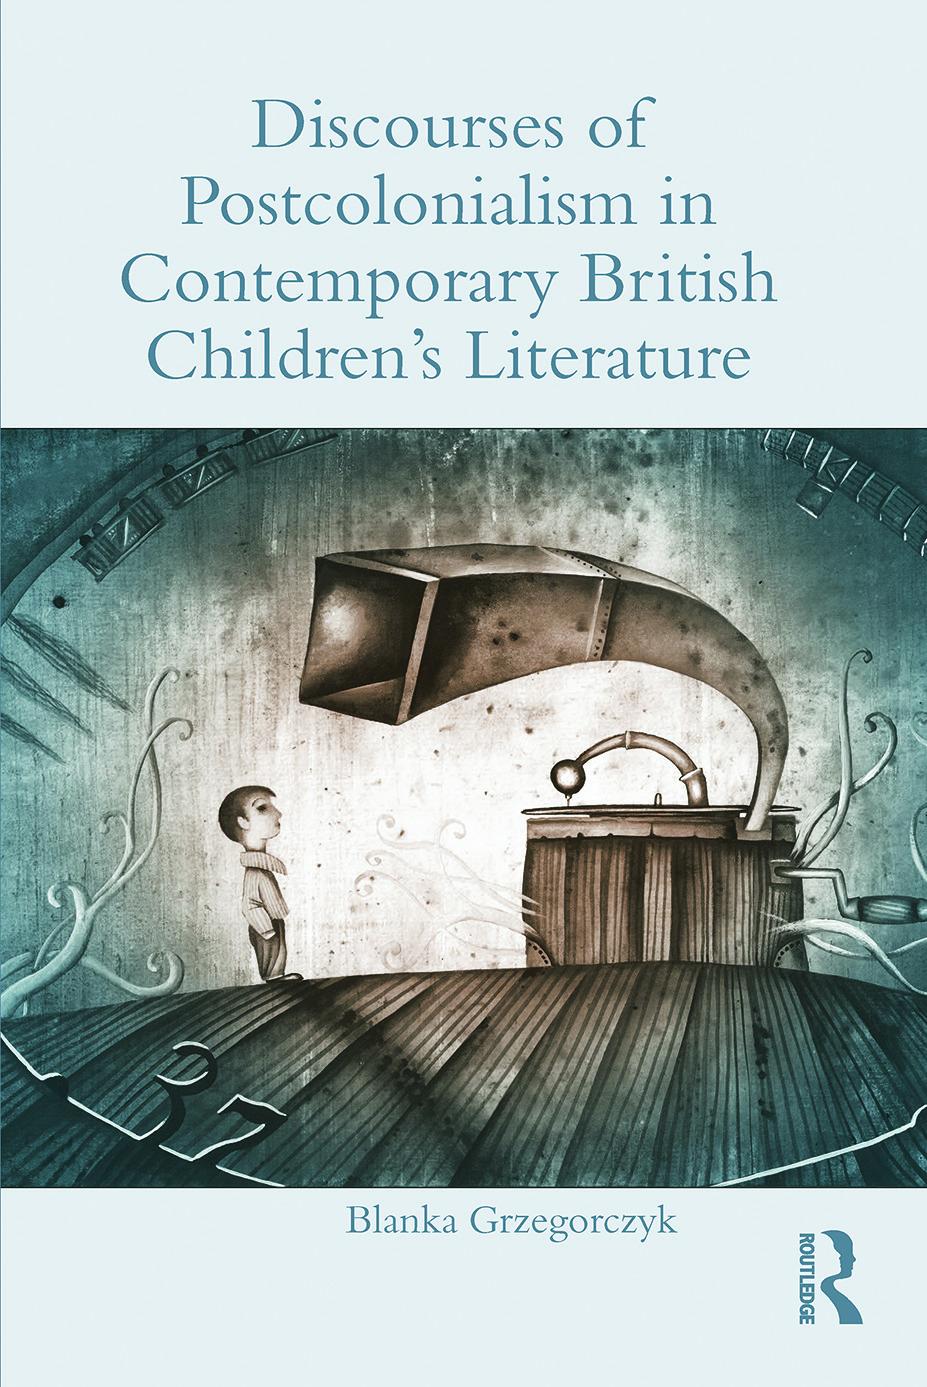 Discourses of Postcolonialism in Contemporary British Children's Literature (Hardback) book cover